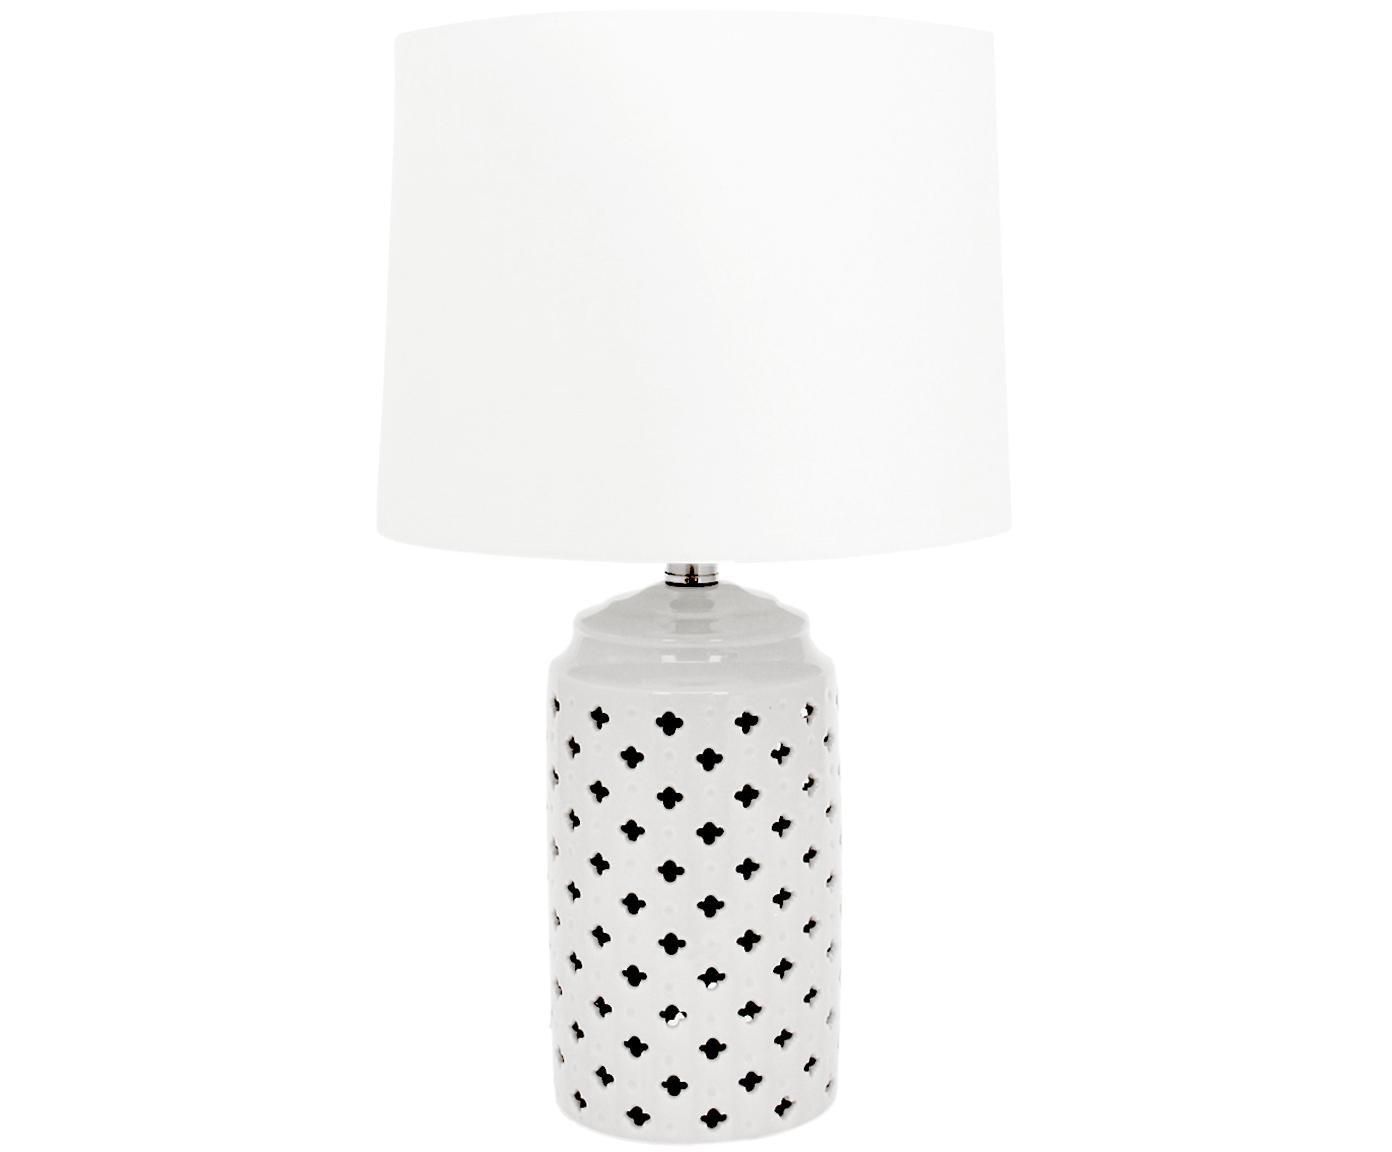 Keramik-Tischlampe Naomi, Lampenschirm: Textil, Weiss, Ø 28 x H 52 cm